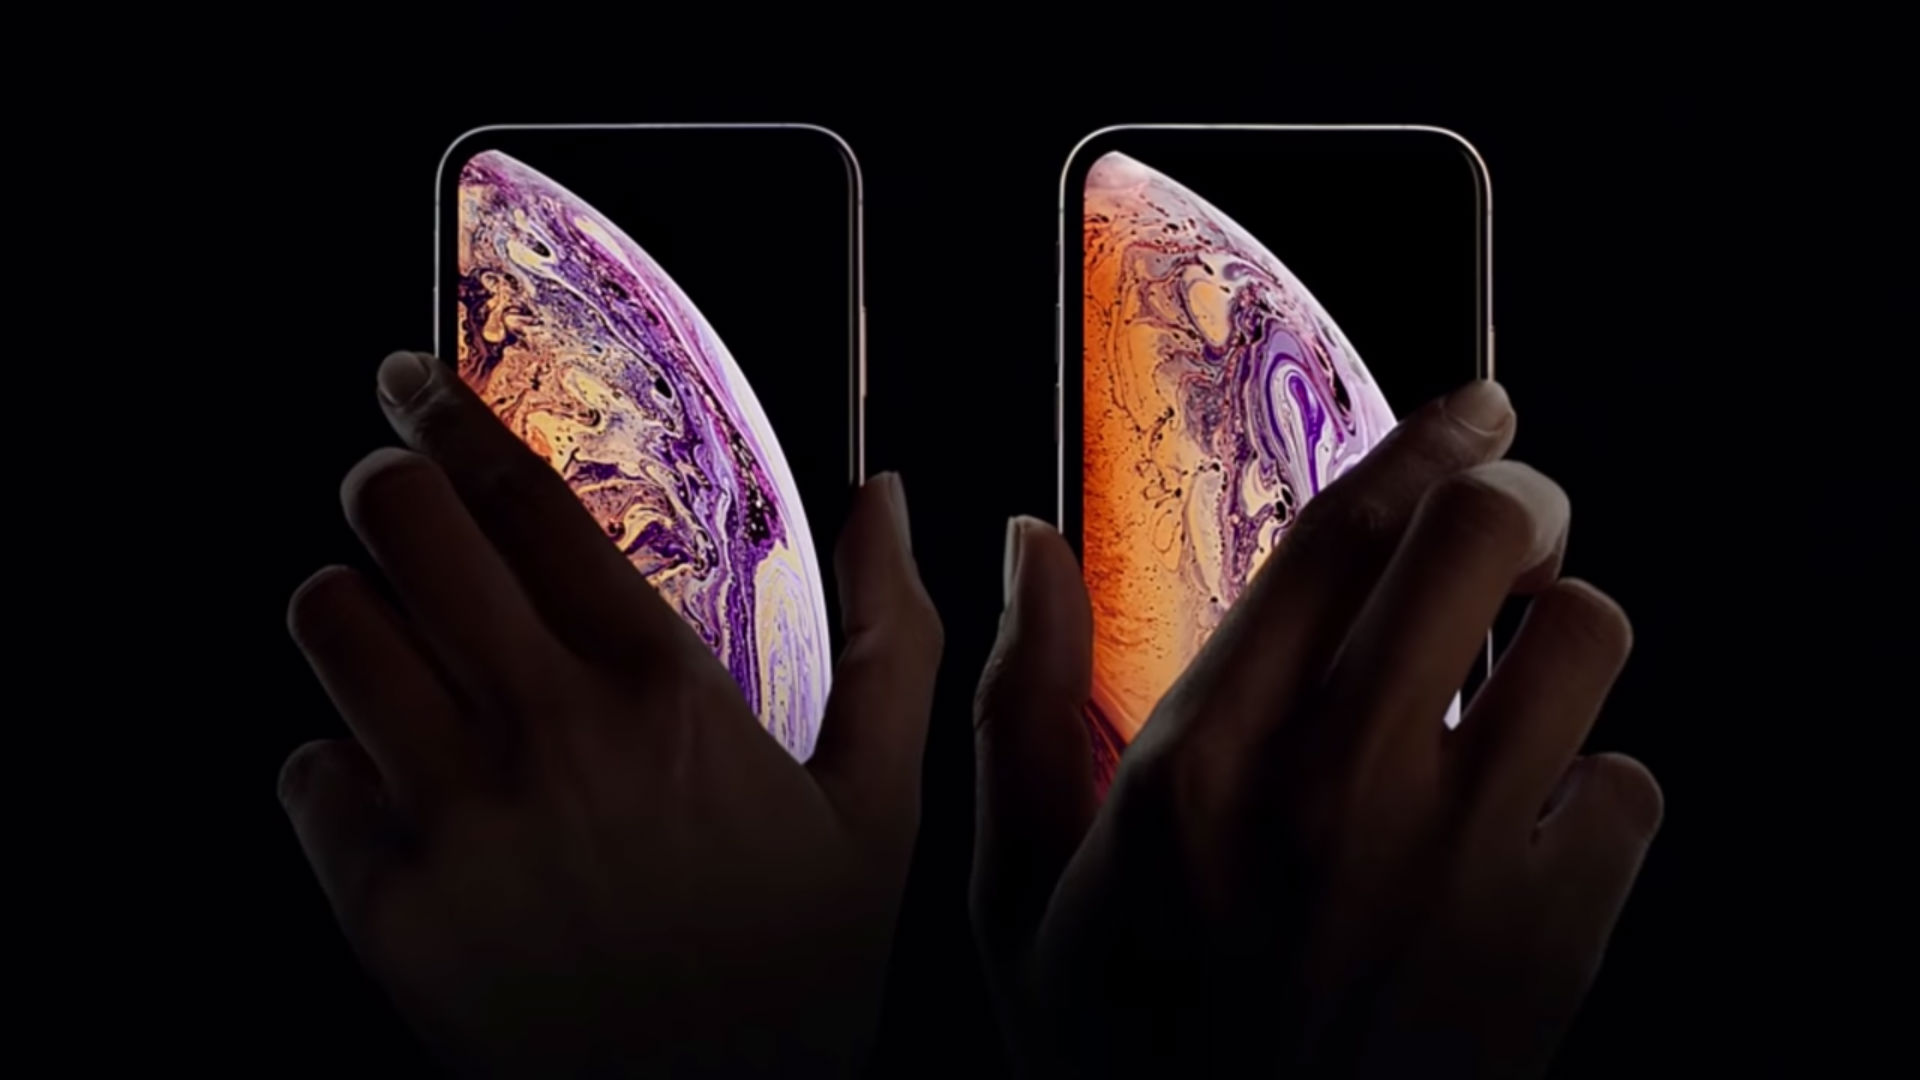 iphone xs vs iphone x image